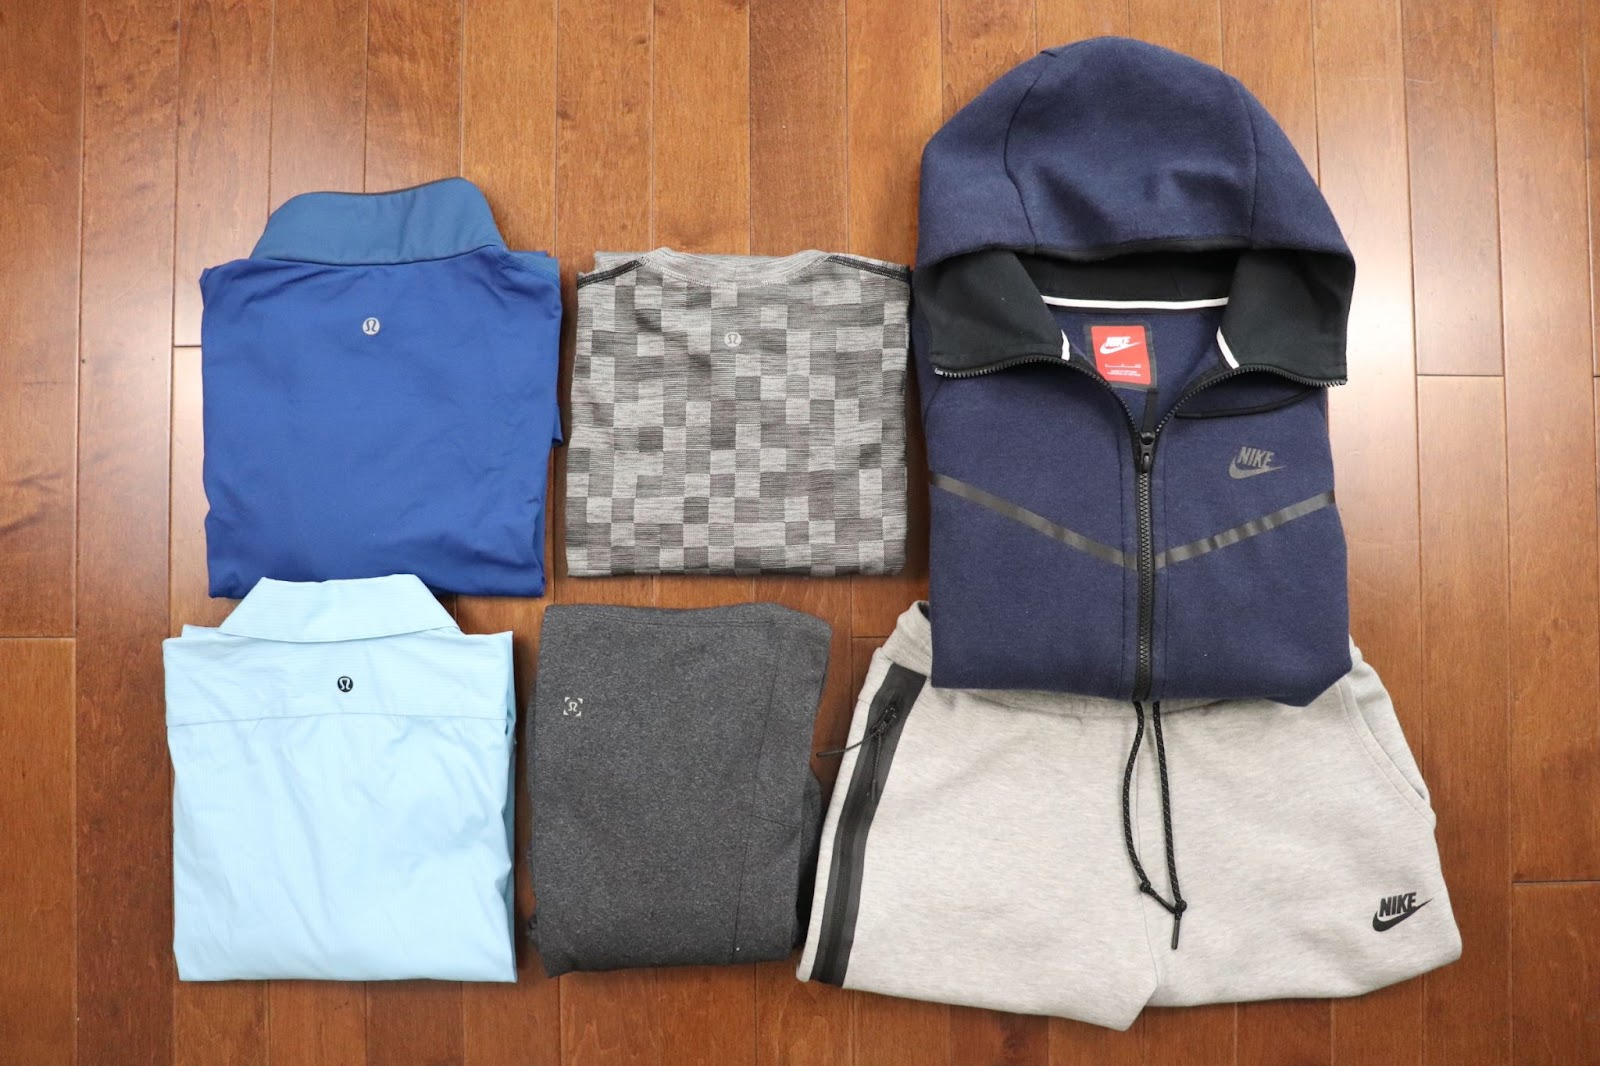 sportswear from Lululemon, Nike and Adidas